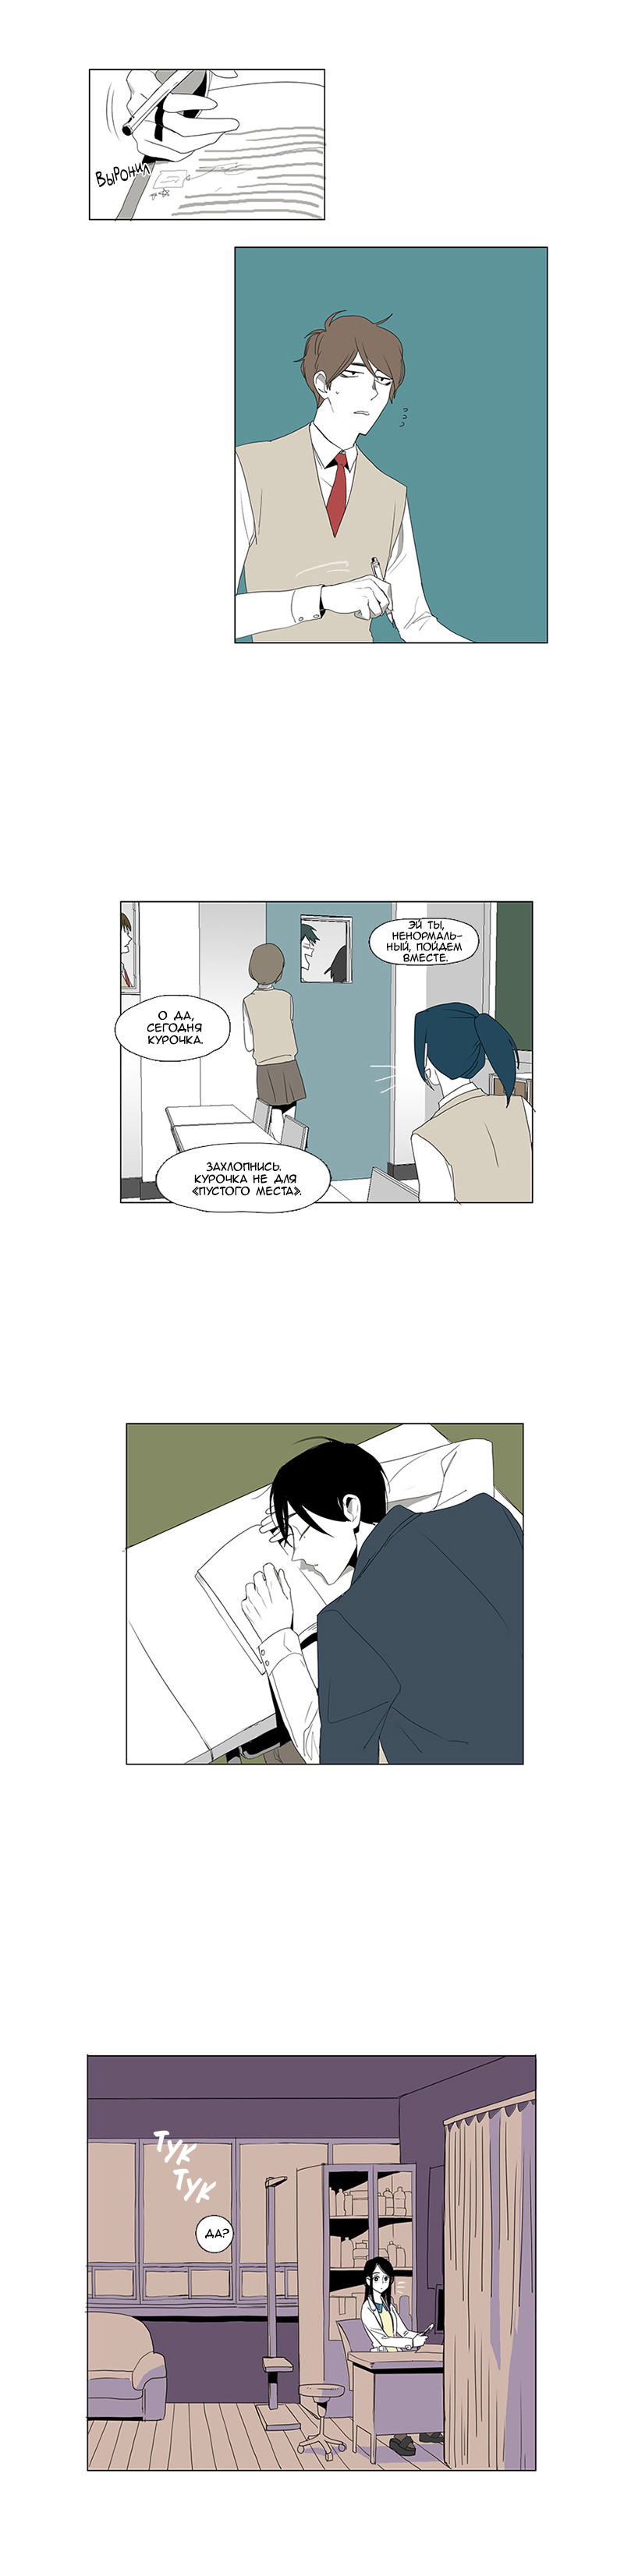 https://r1.ninemanga.com/comics/pic2/33/27873/278406/1447697136405.jpg Page 10